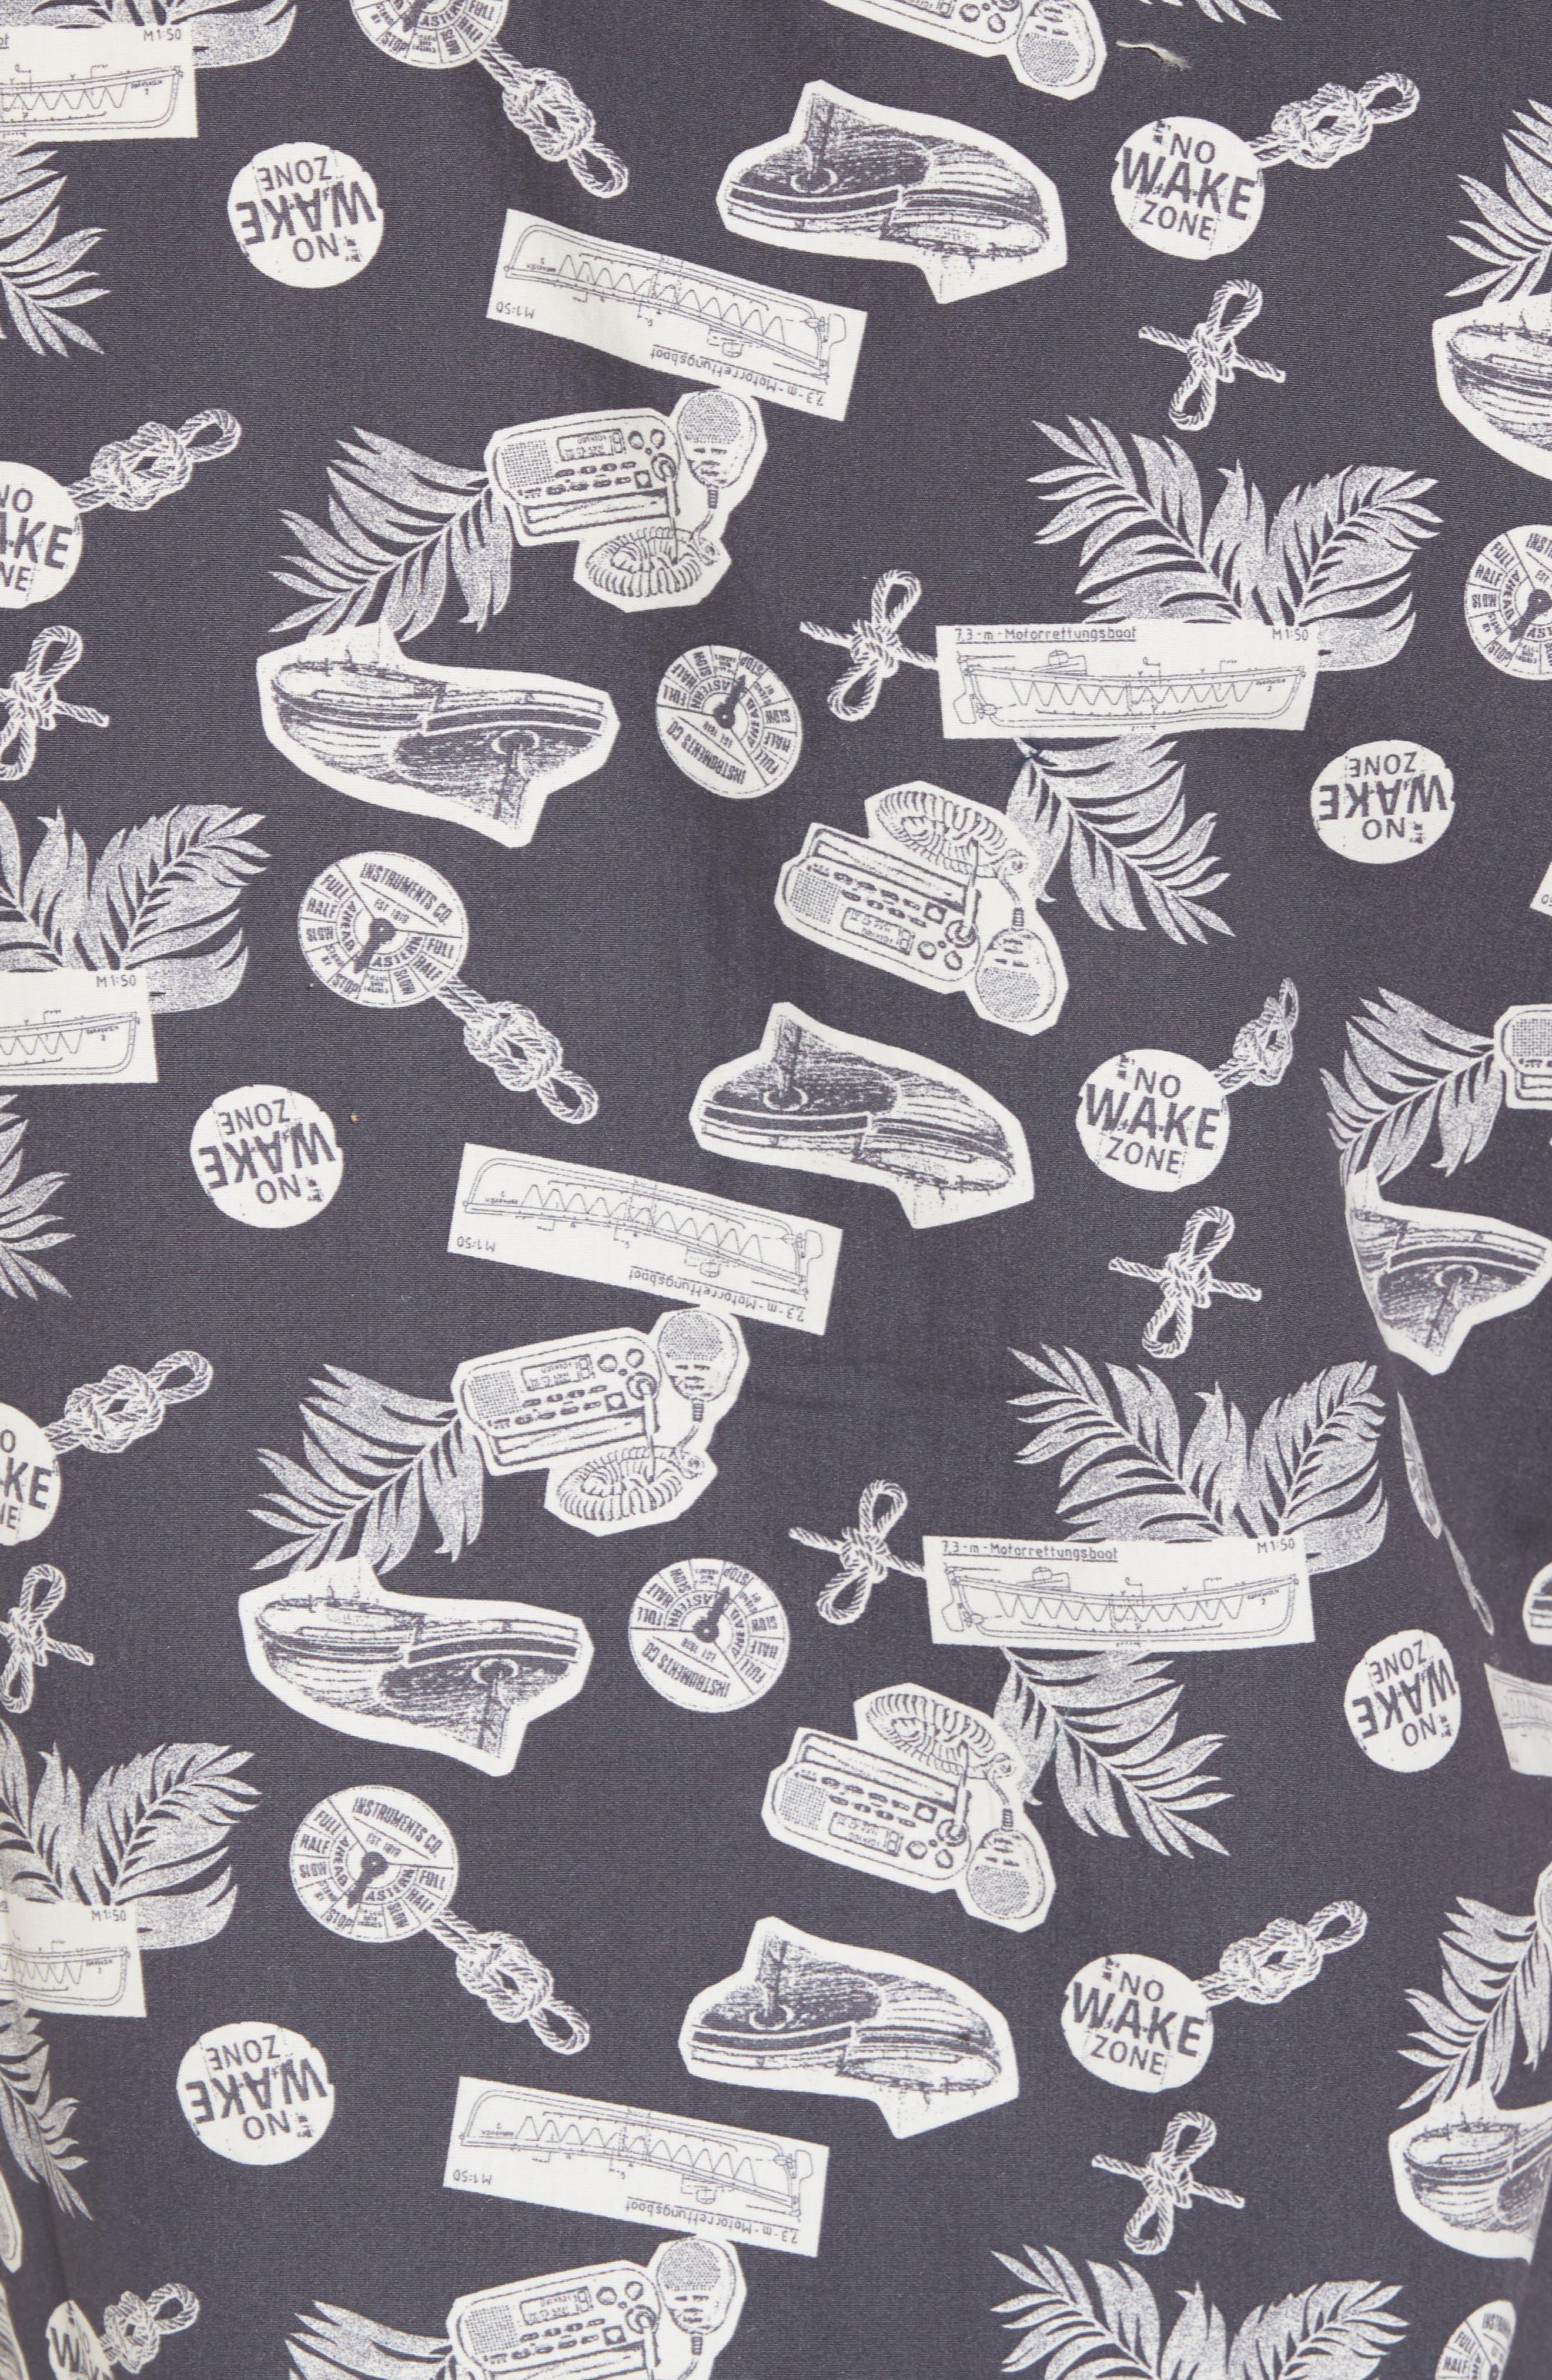 Short Sleeve Print Poplin Shirt,                             Alternate thumbnail 5, color,                             Grey Onyx Boat Print